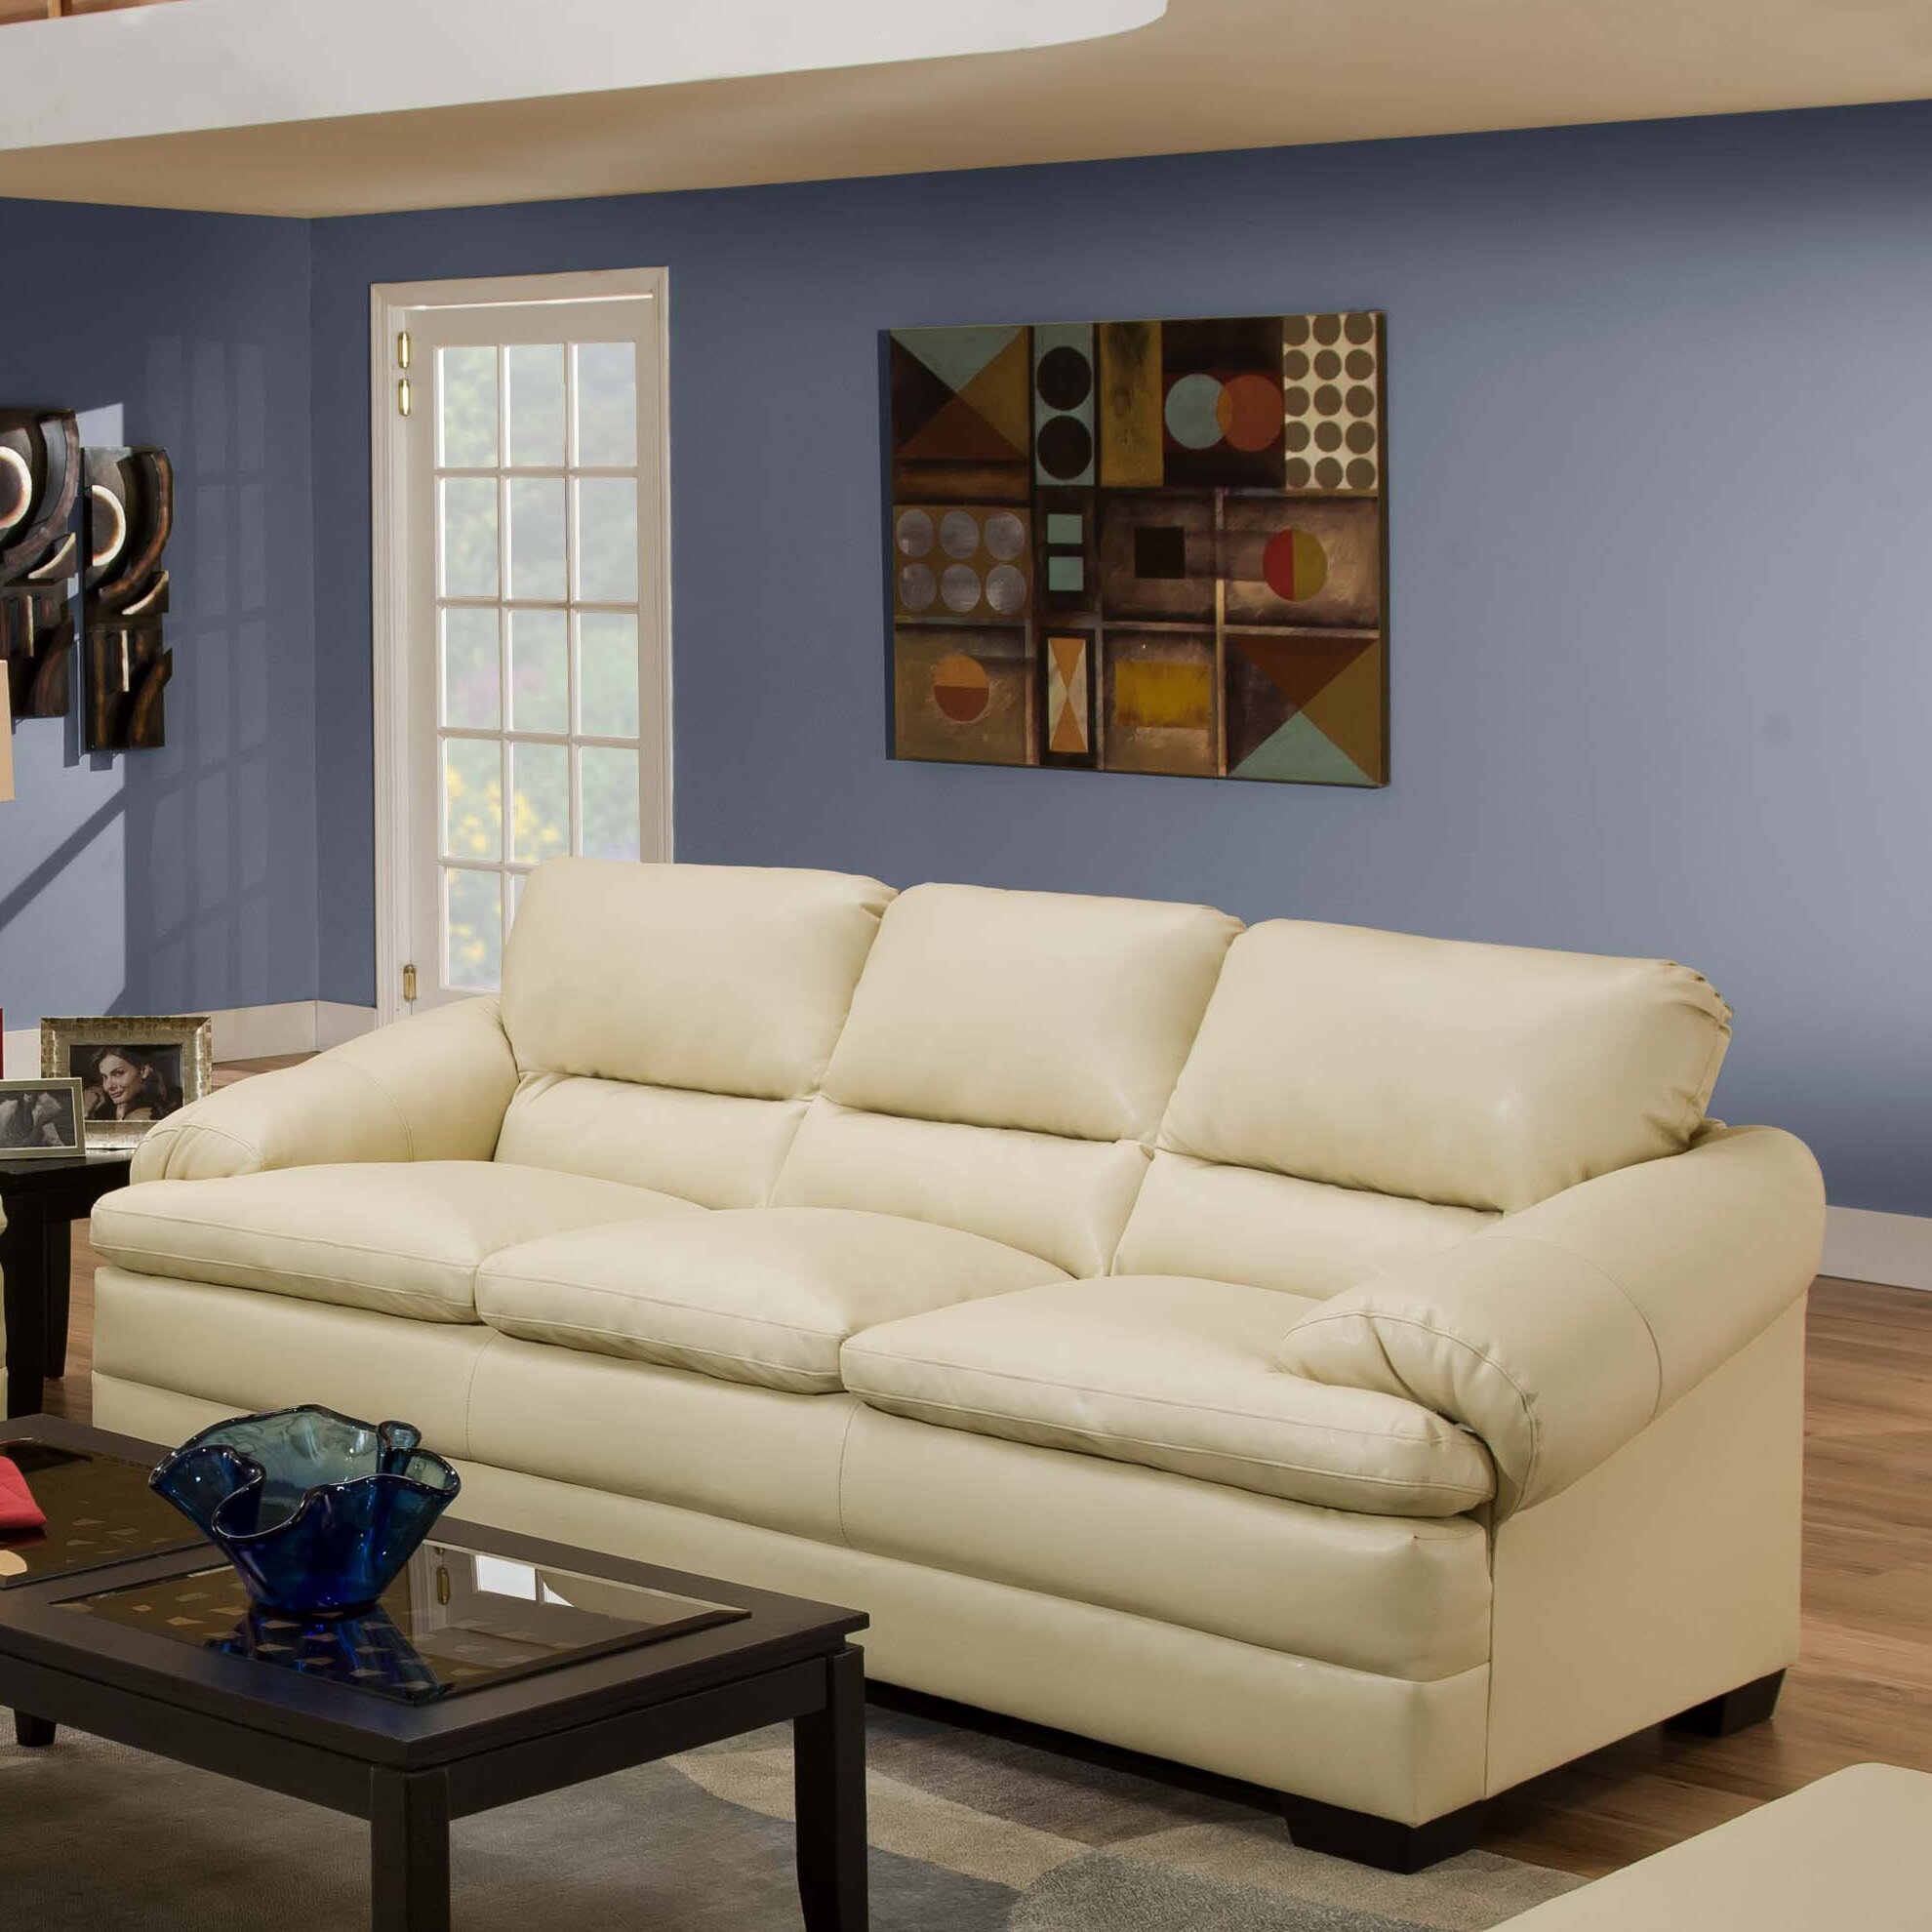 Red Barrel Studio Simmons Upholstery Reynolds Sofa & Reviews | Wayfair